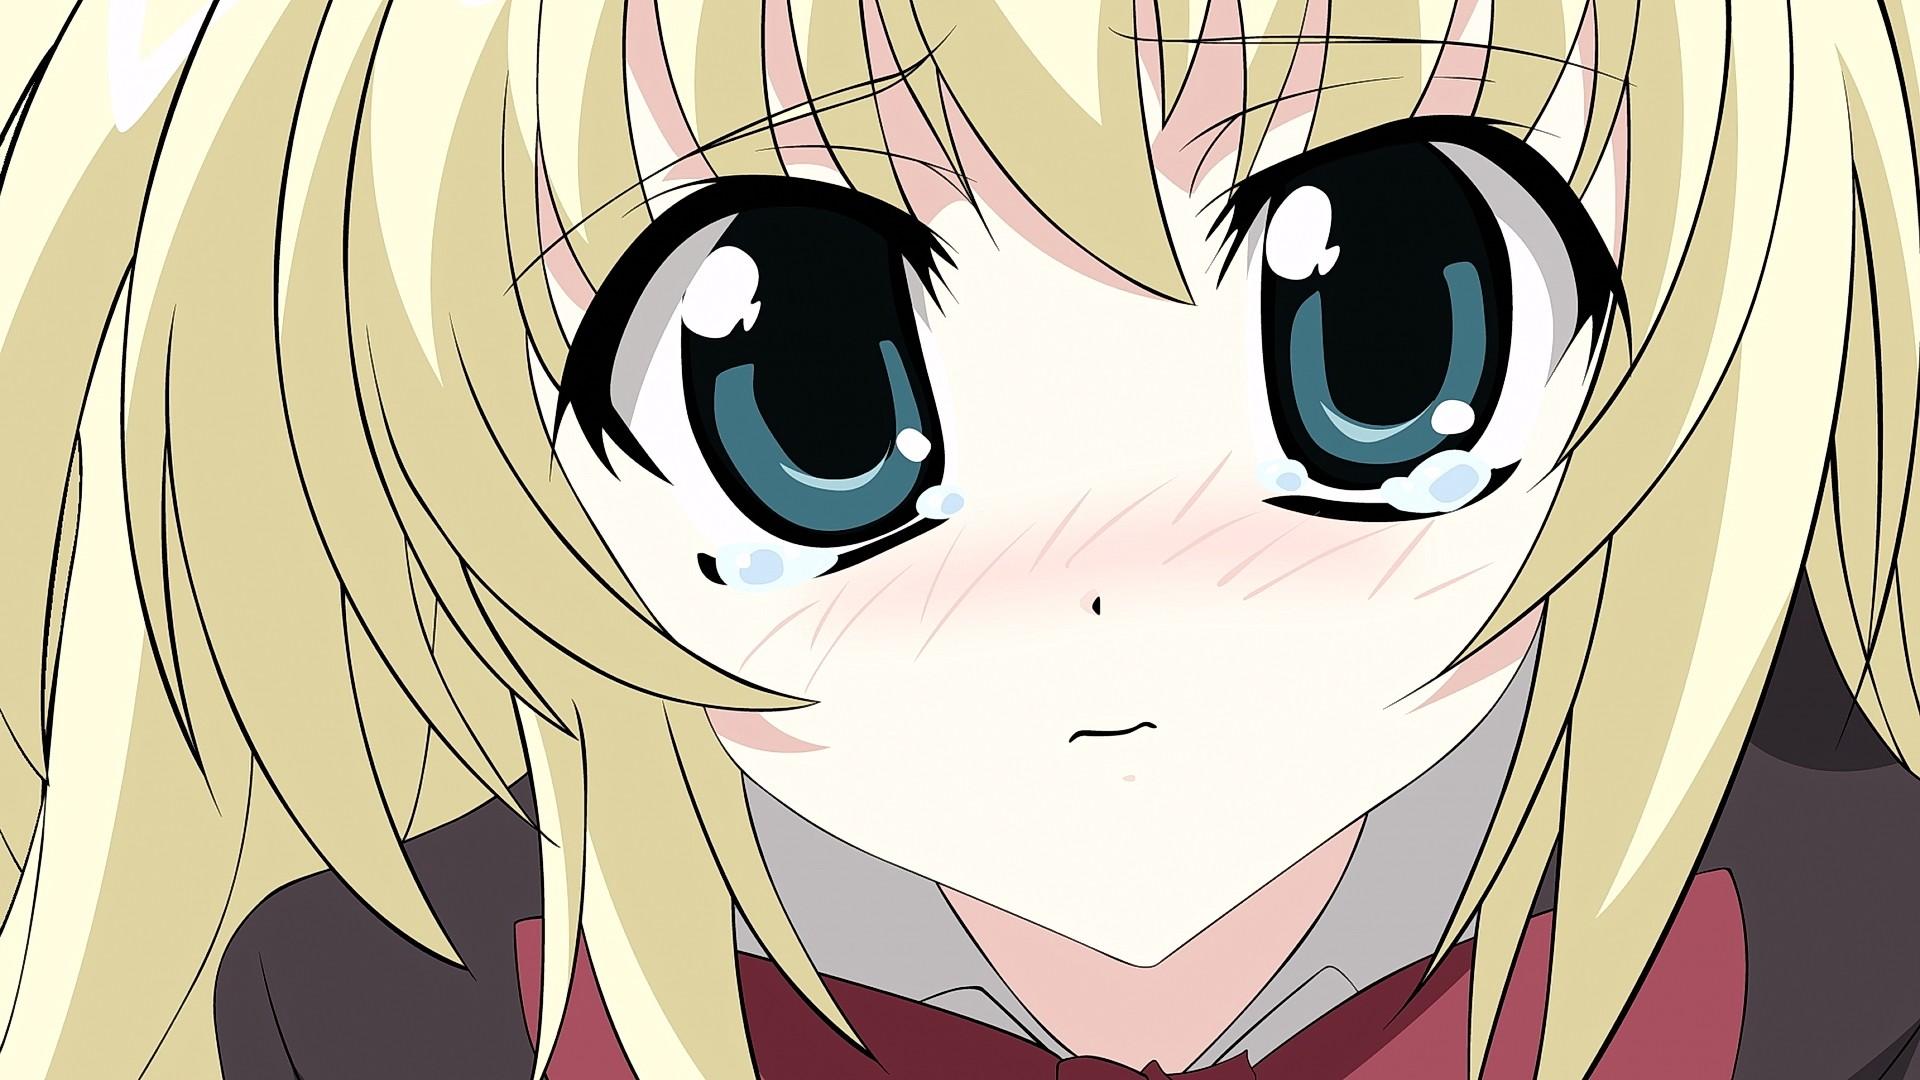 Fondos De Pantalla Ilustracion Rubia Pelo Largo Anime Chicas